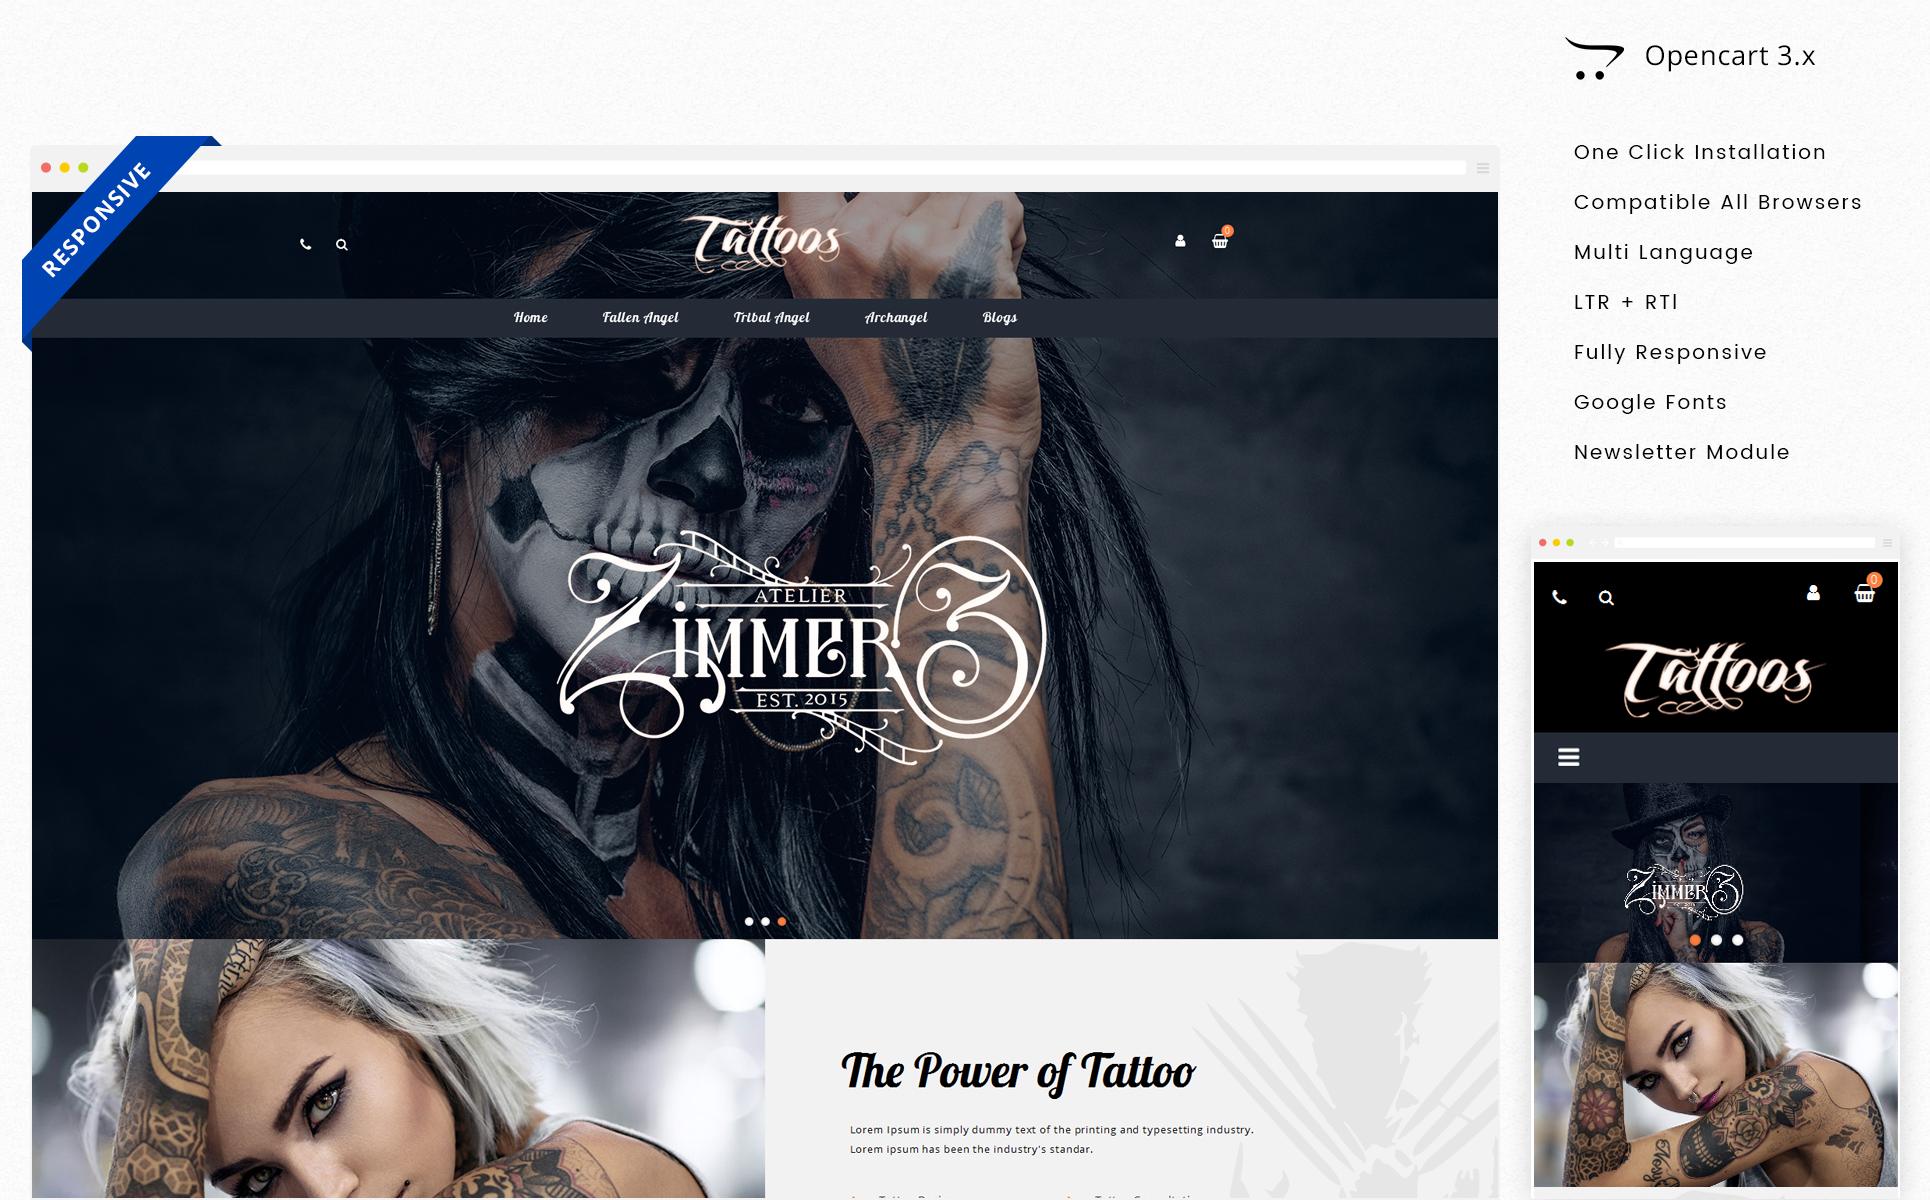 Tattoos OpenCart Template